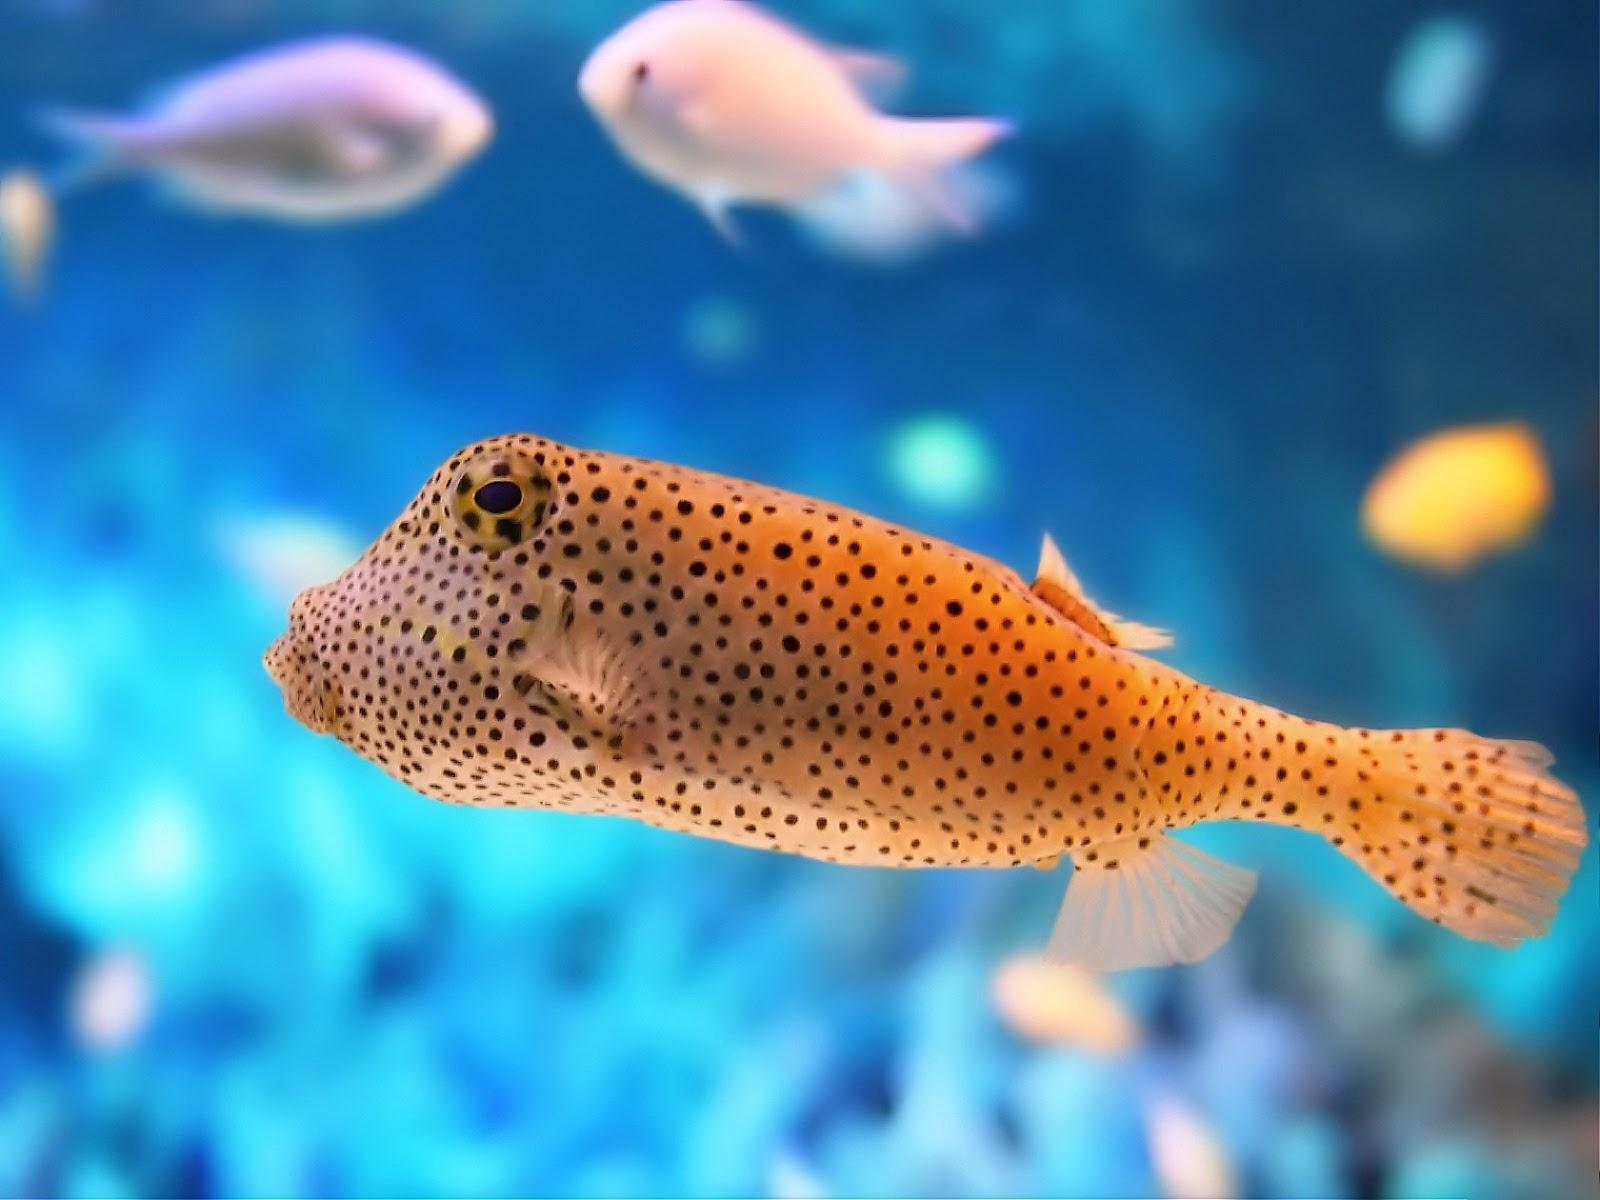 Fish HD Wallpapers - Amaxing